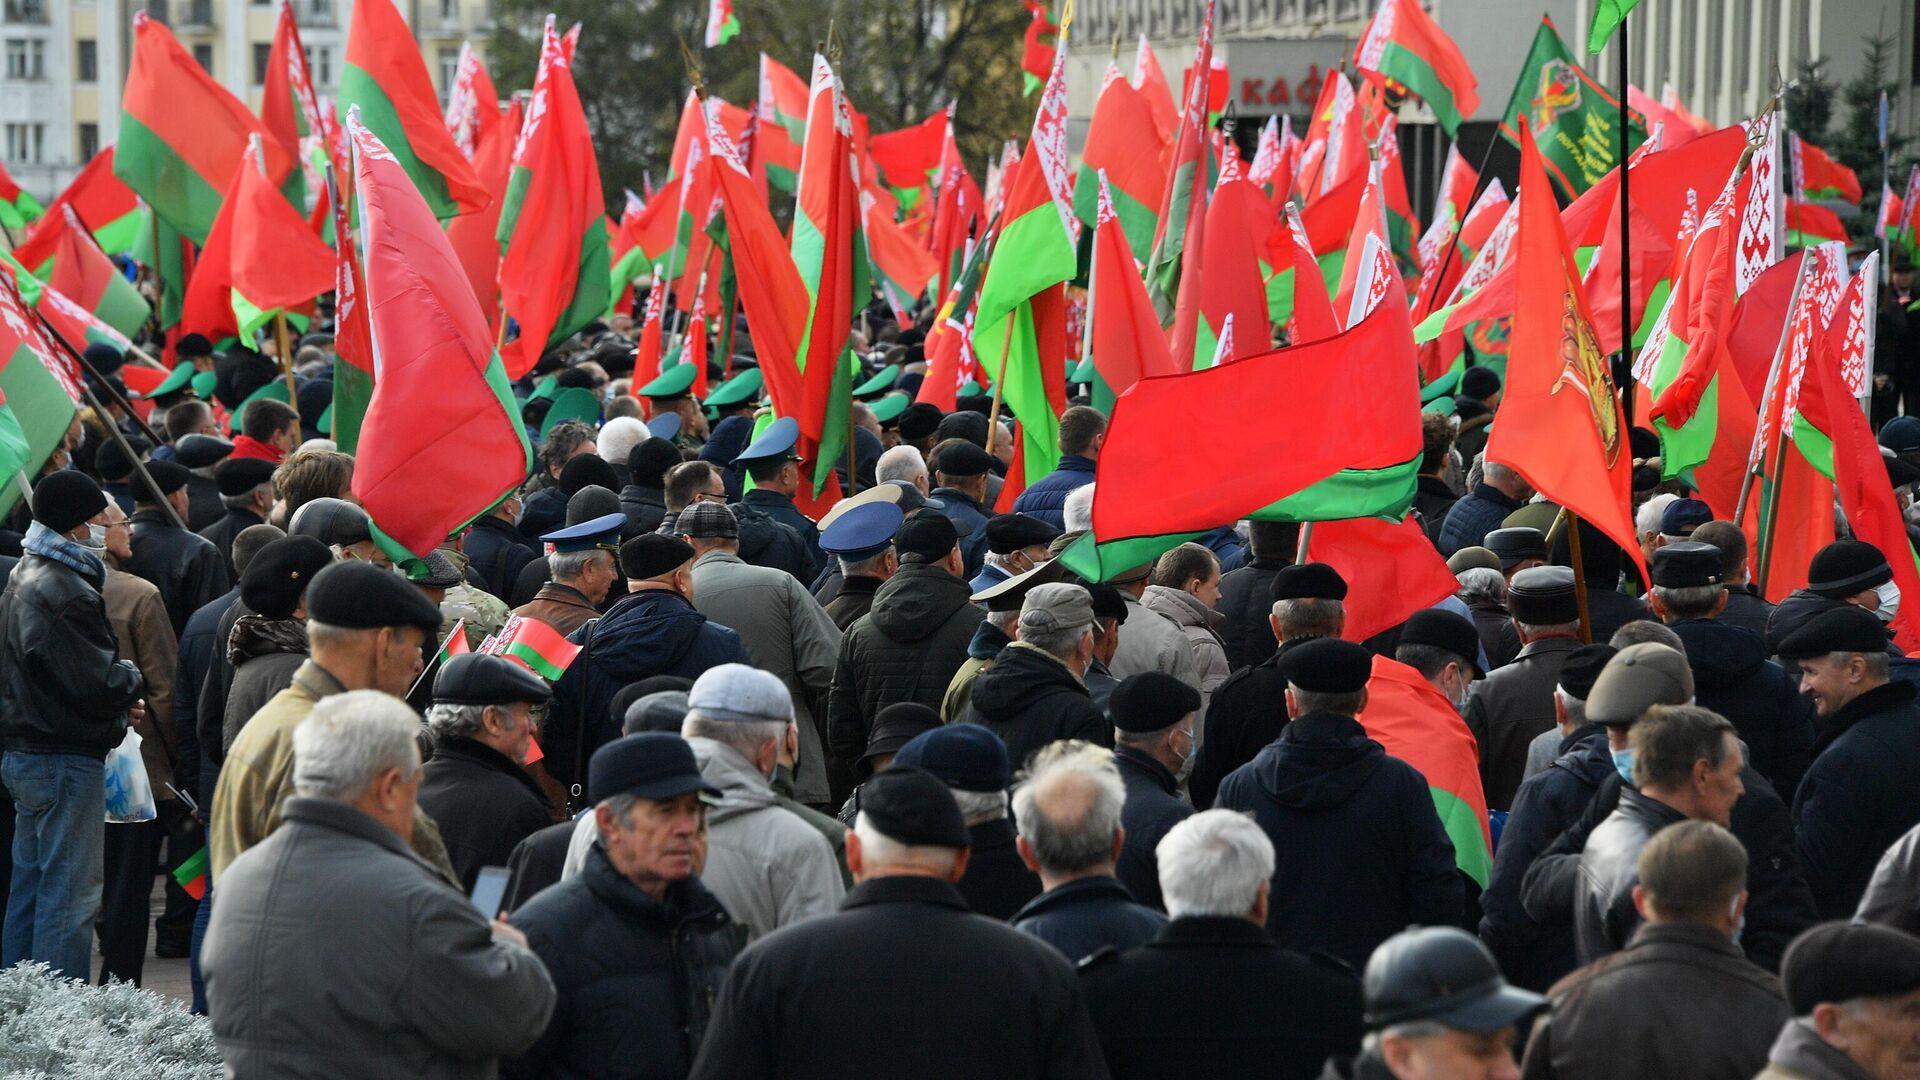 Митинг сторонников президента Белоруссии Александра Лукашенко в Минске - РИА Новости, 1920, 22.12.2020